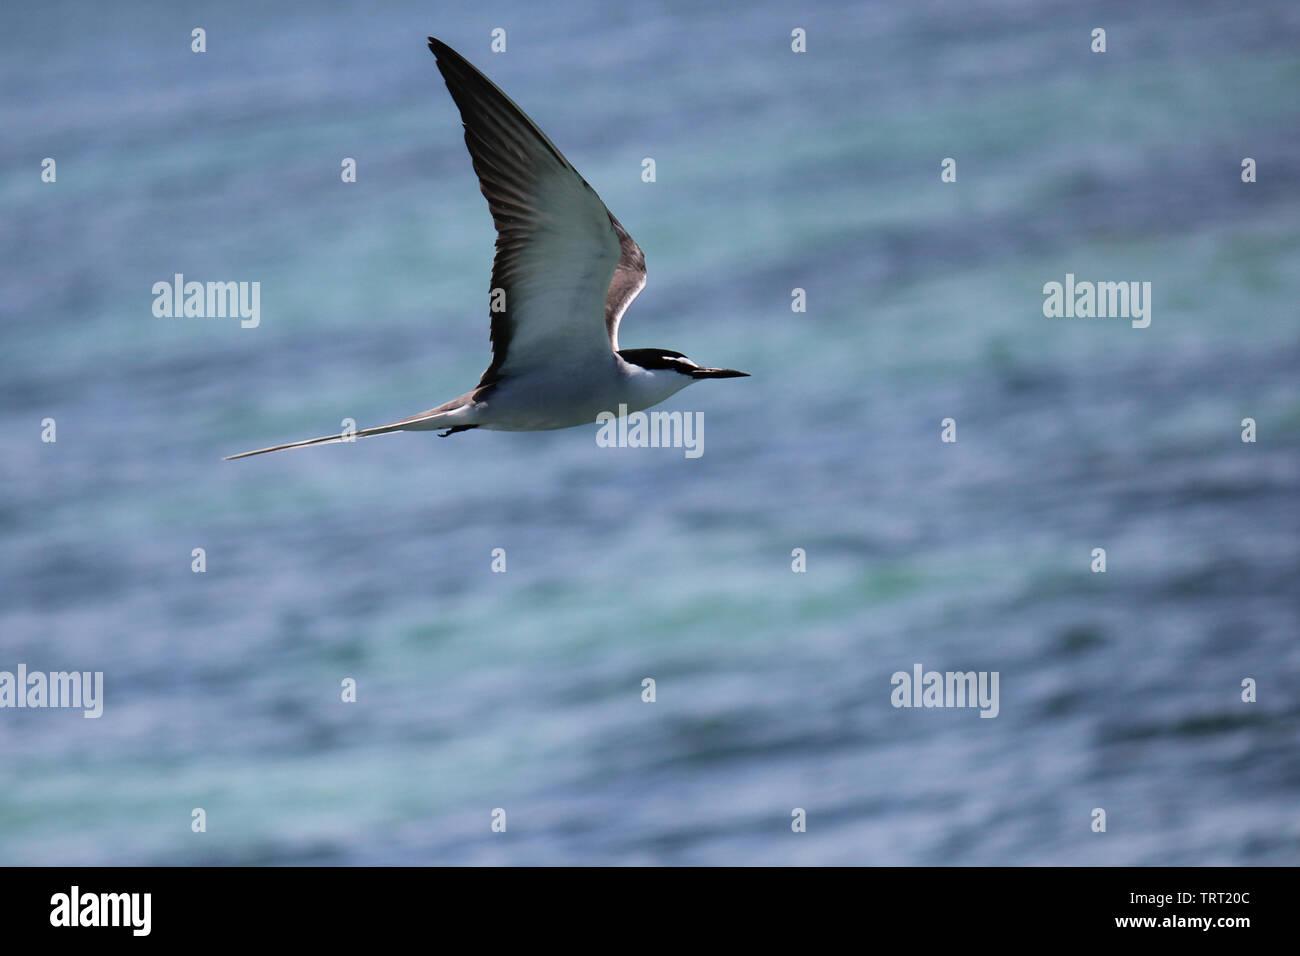 Bridled Tern - Stock Image